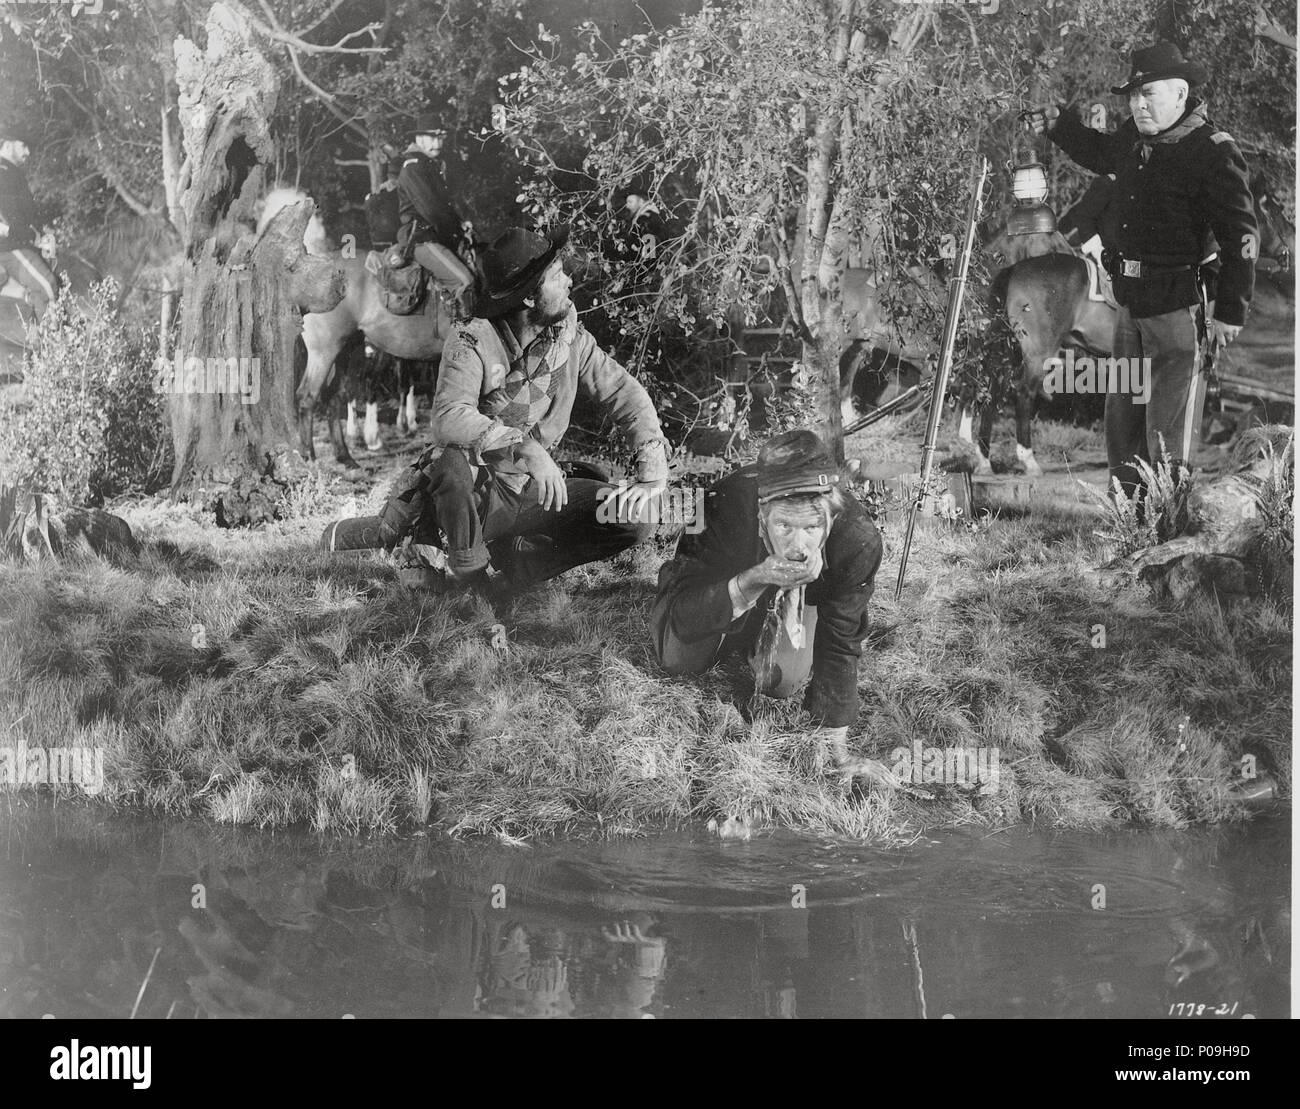 Original Film Title: HOW THE WEST WAS WON.  English Title: HOW THE WEST WAS WON.  Film Director: GEORGE MARSHALL; JOHN FORD; RICHARD THORPE; HENRY HATHAWAY.  Year: 1962. Credit: M.G.M/CINERAMA / Album - Stock Image